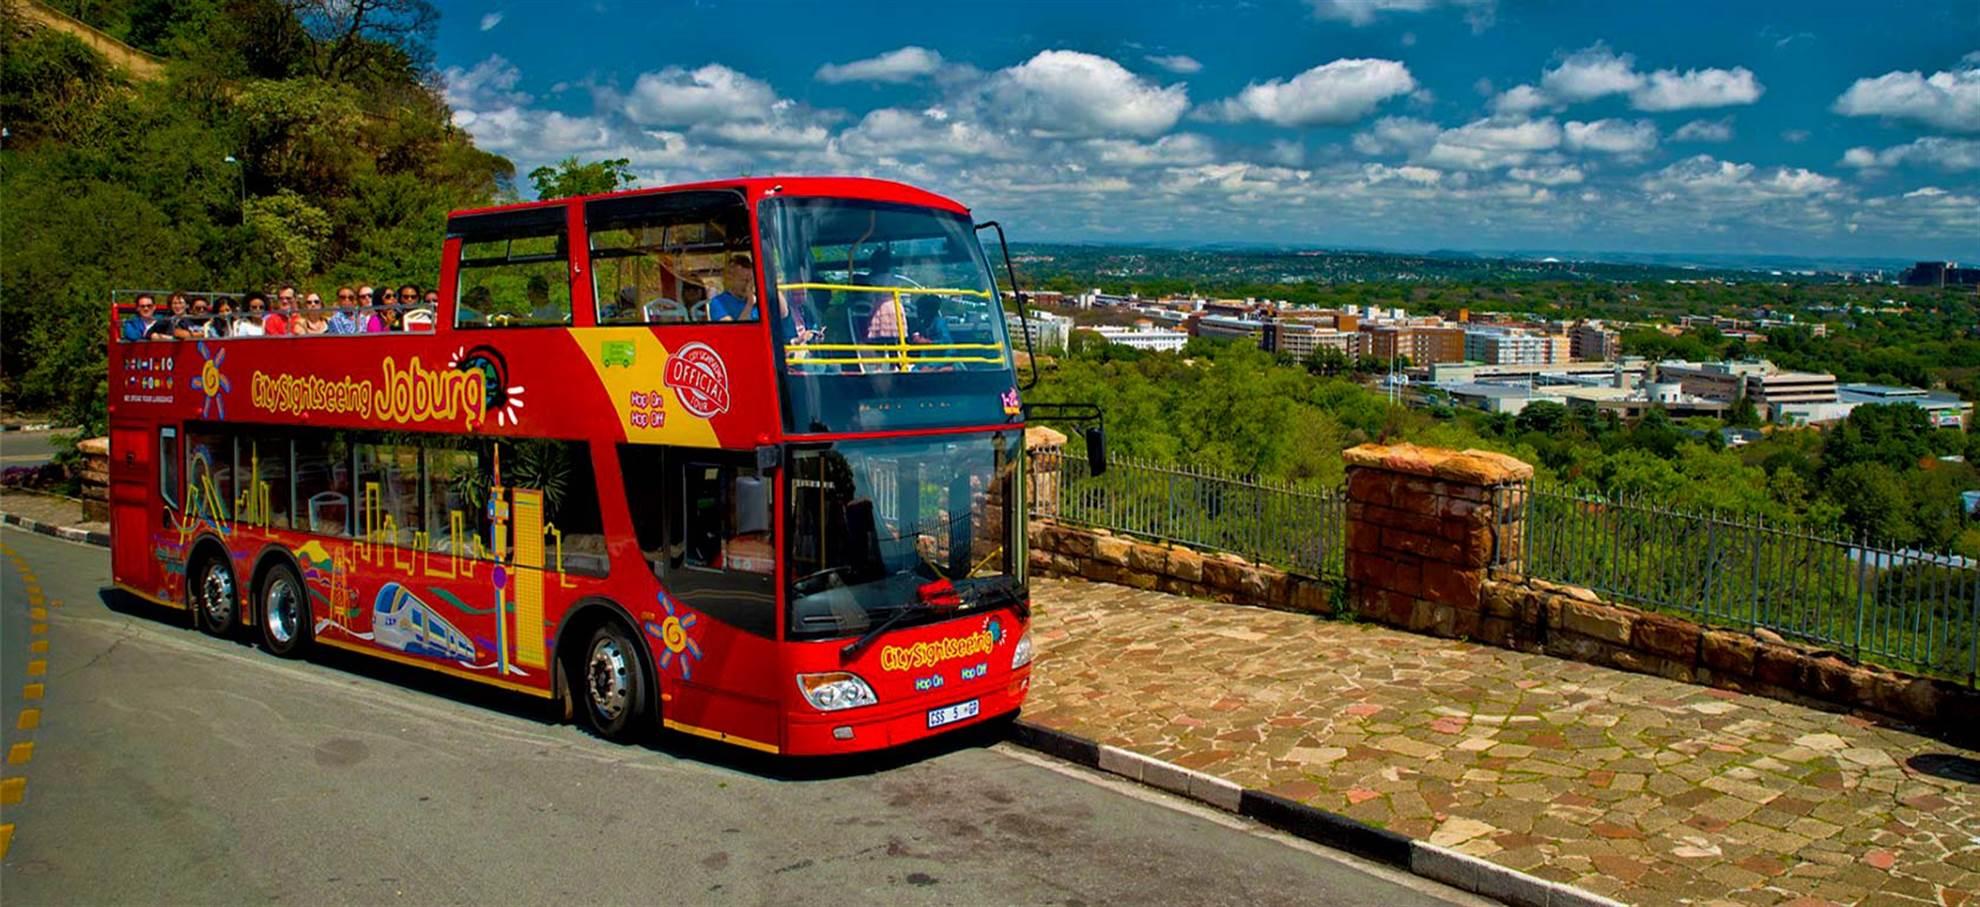 Johannesburg Hop-on Hop-off Bus